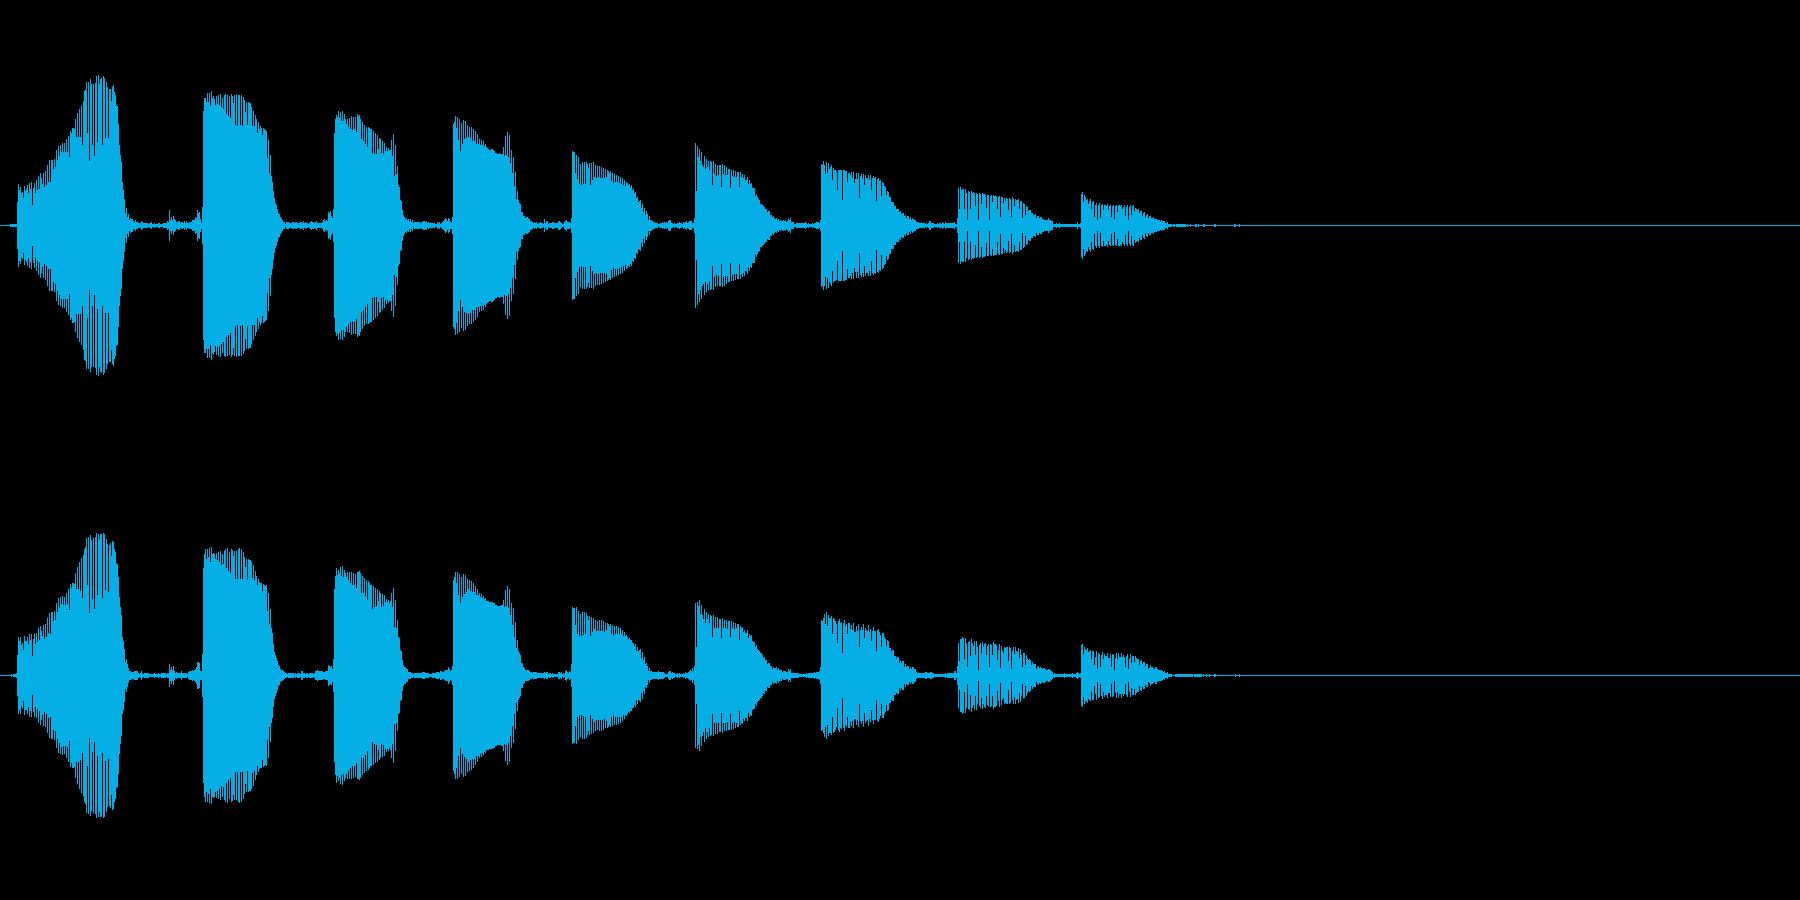 STEEL GUITAR:笑いアク...の再生済みの波形